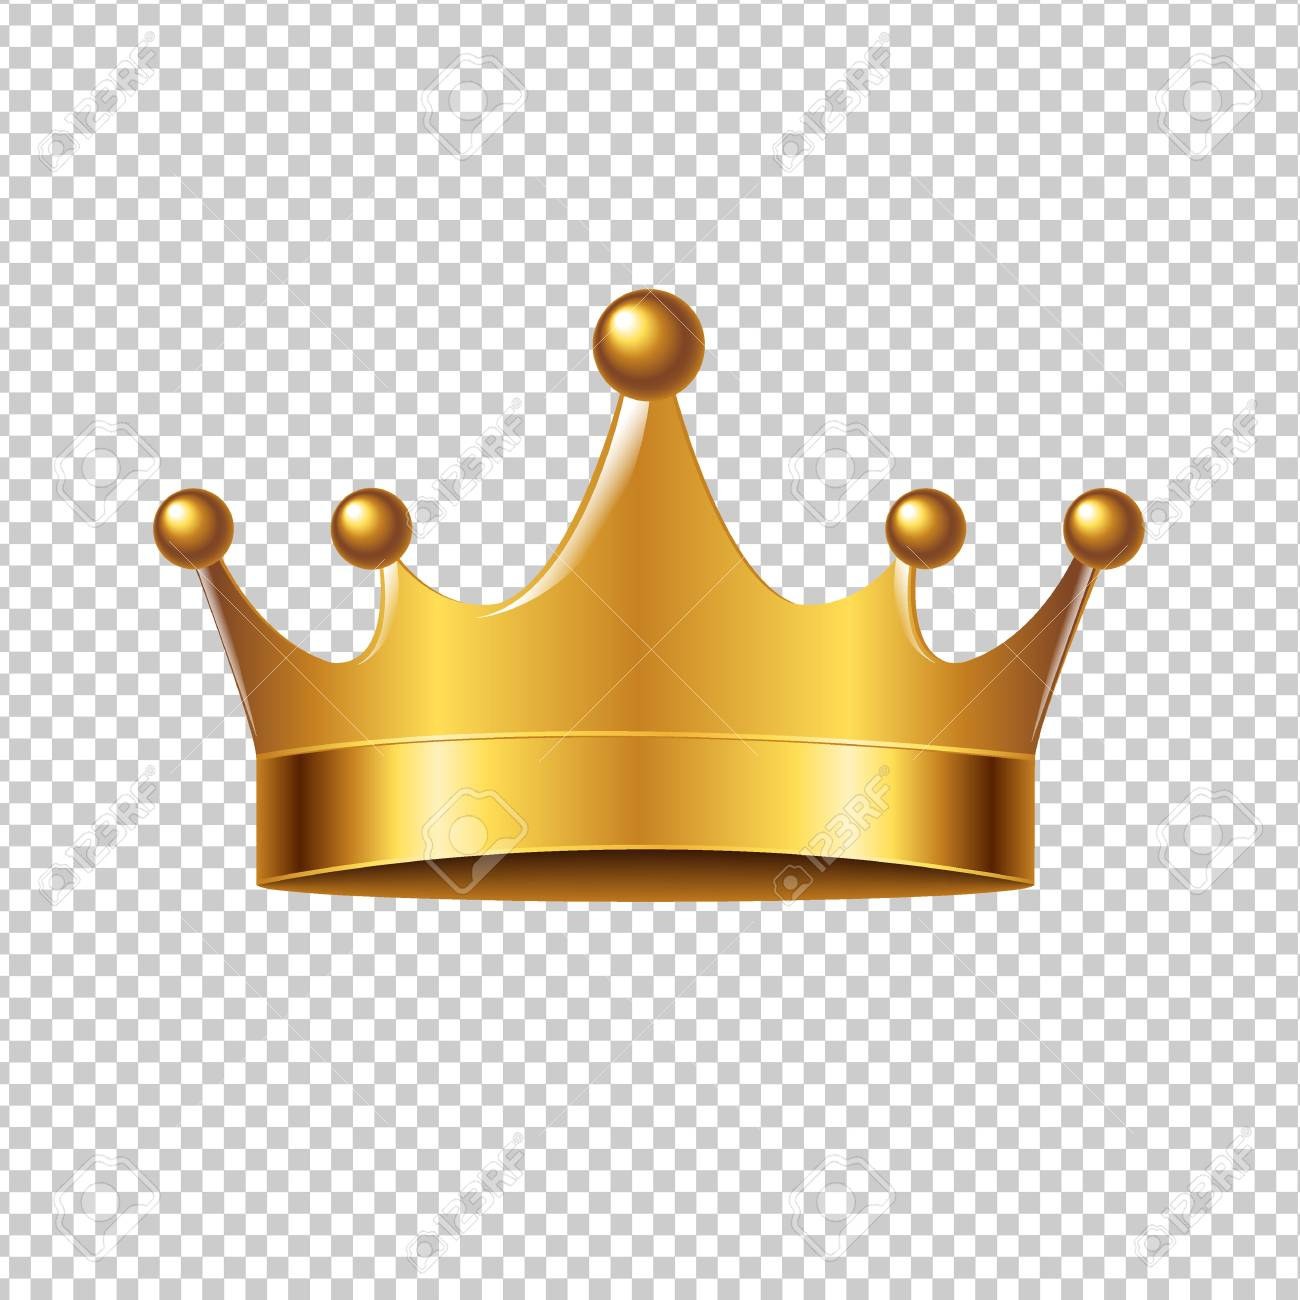 Golden Crown With Gradient Mesh, Vector Illustration - 73802693